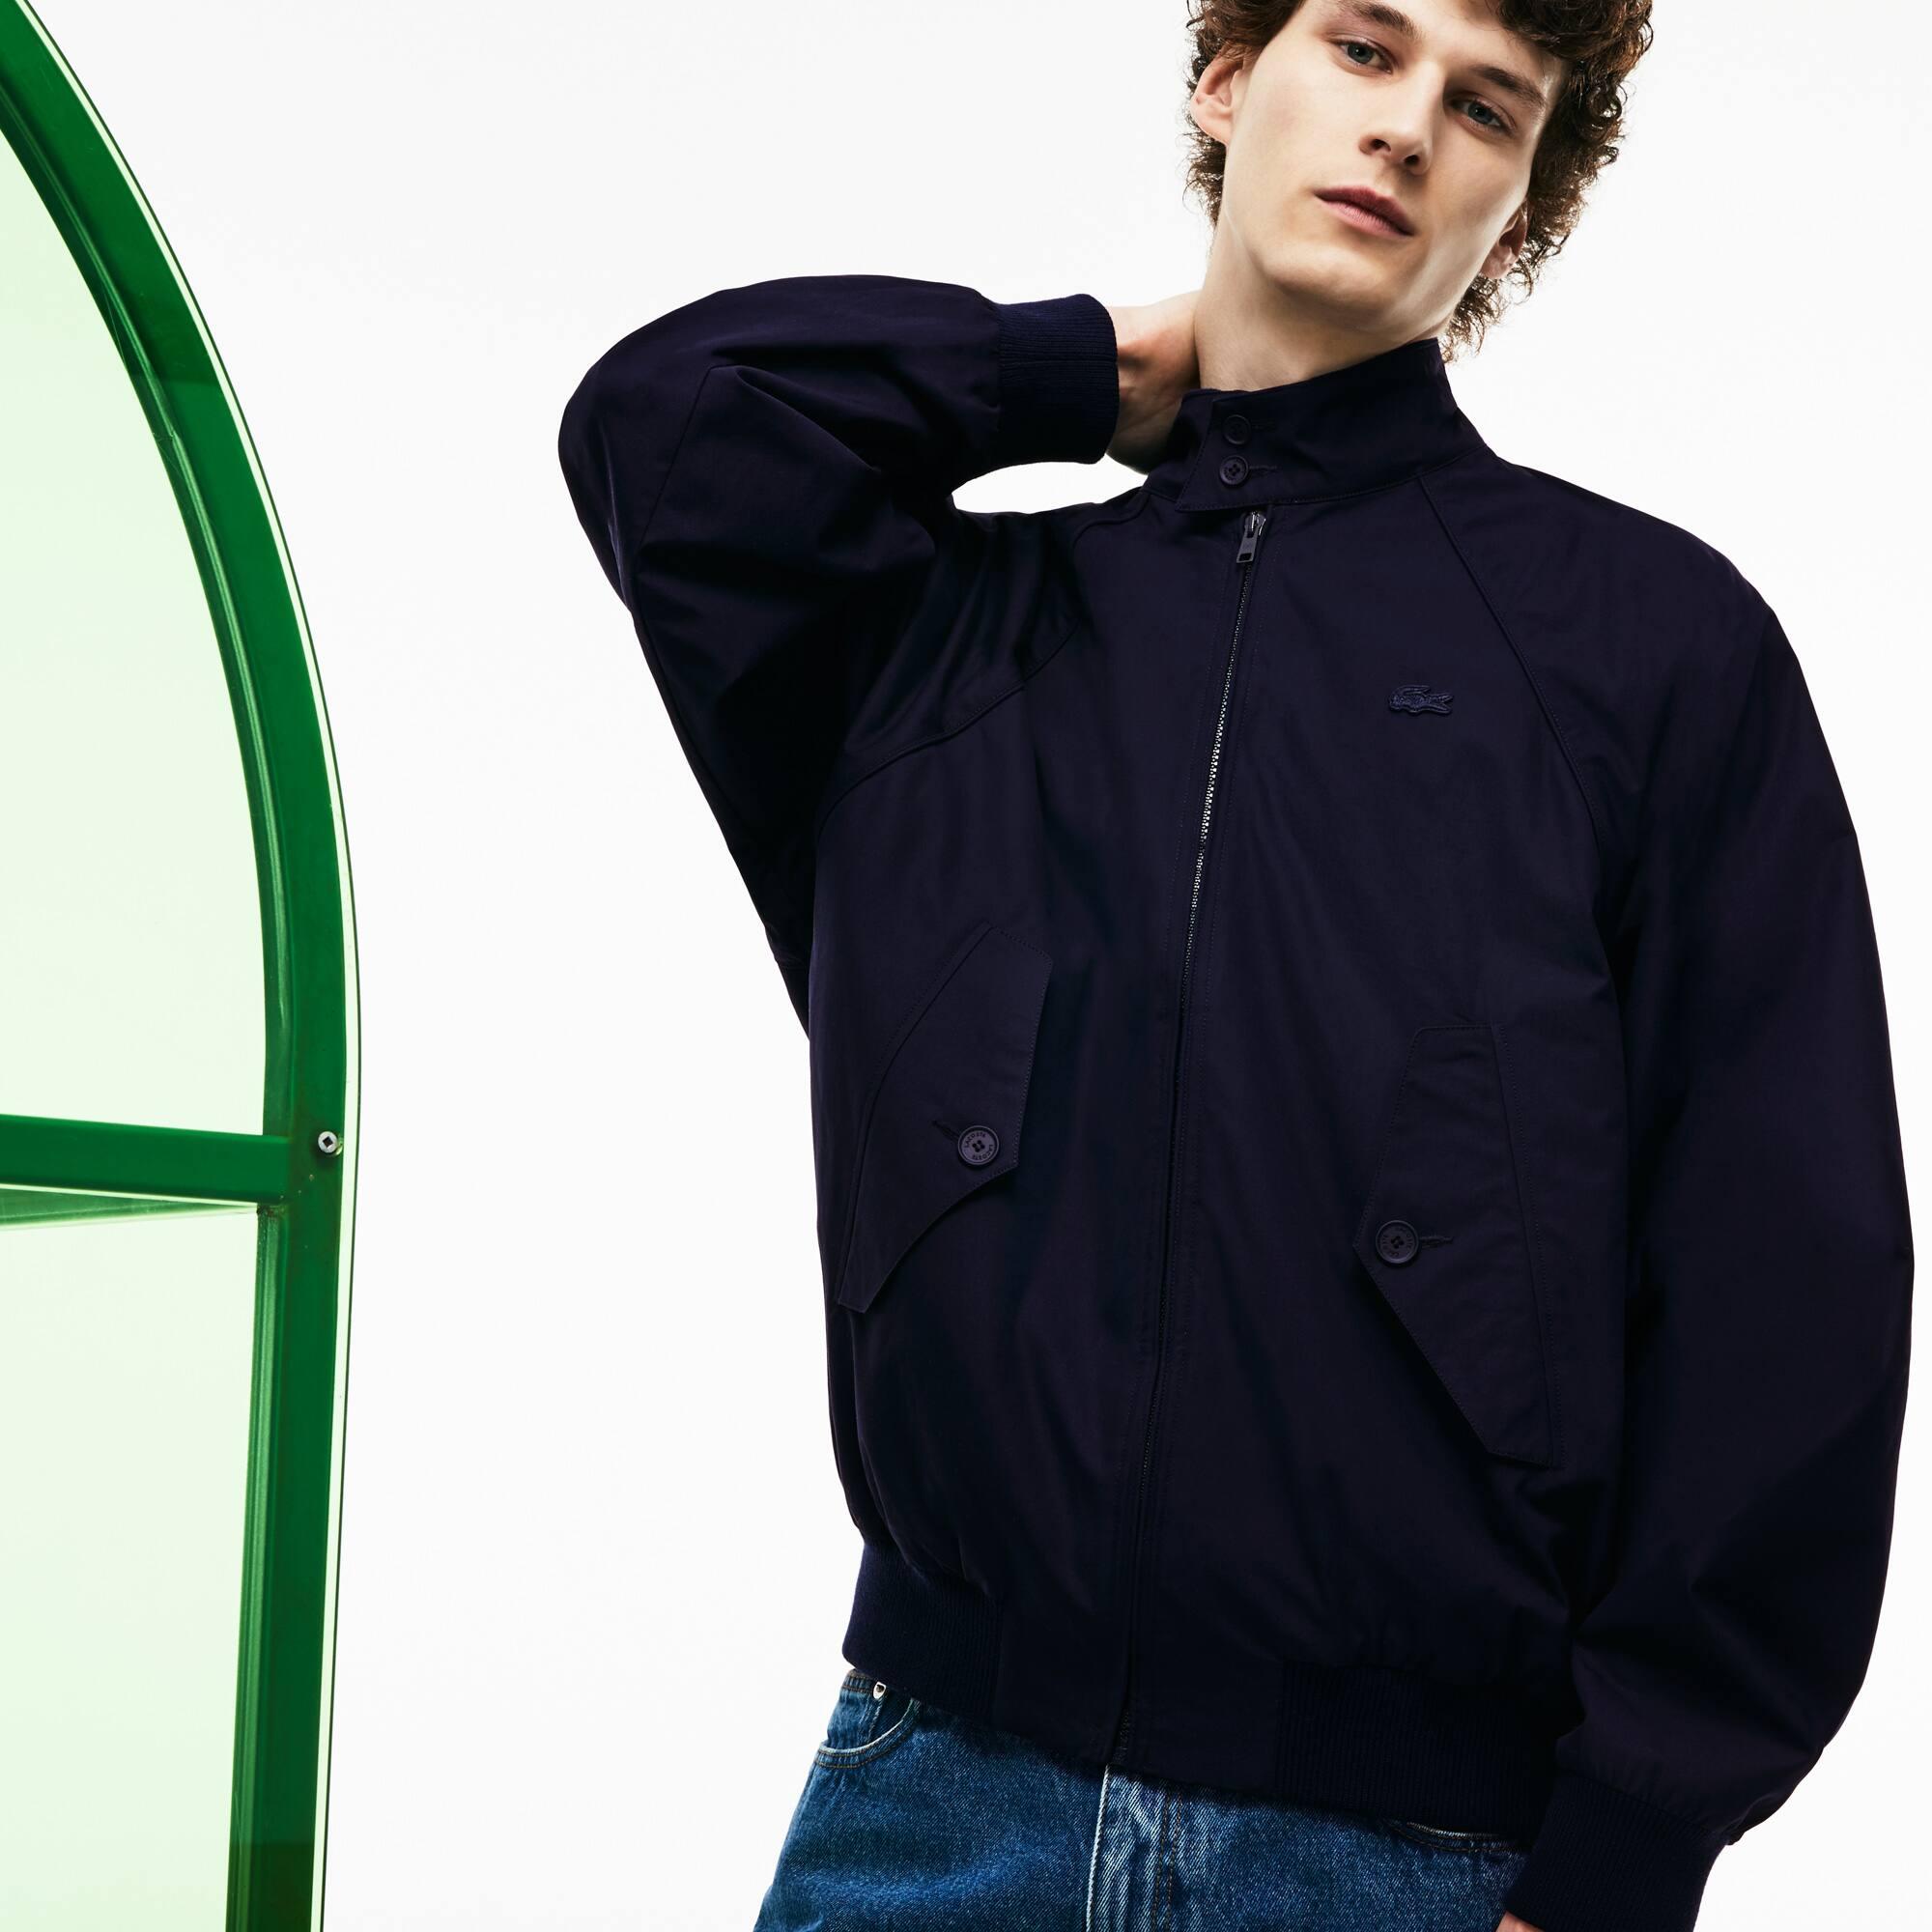 Men's Fashion Show Oversized Cotton Canvas Zippered Jacket